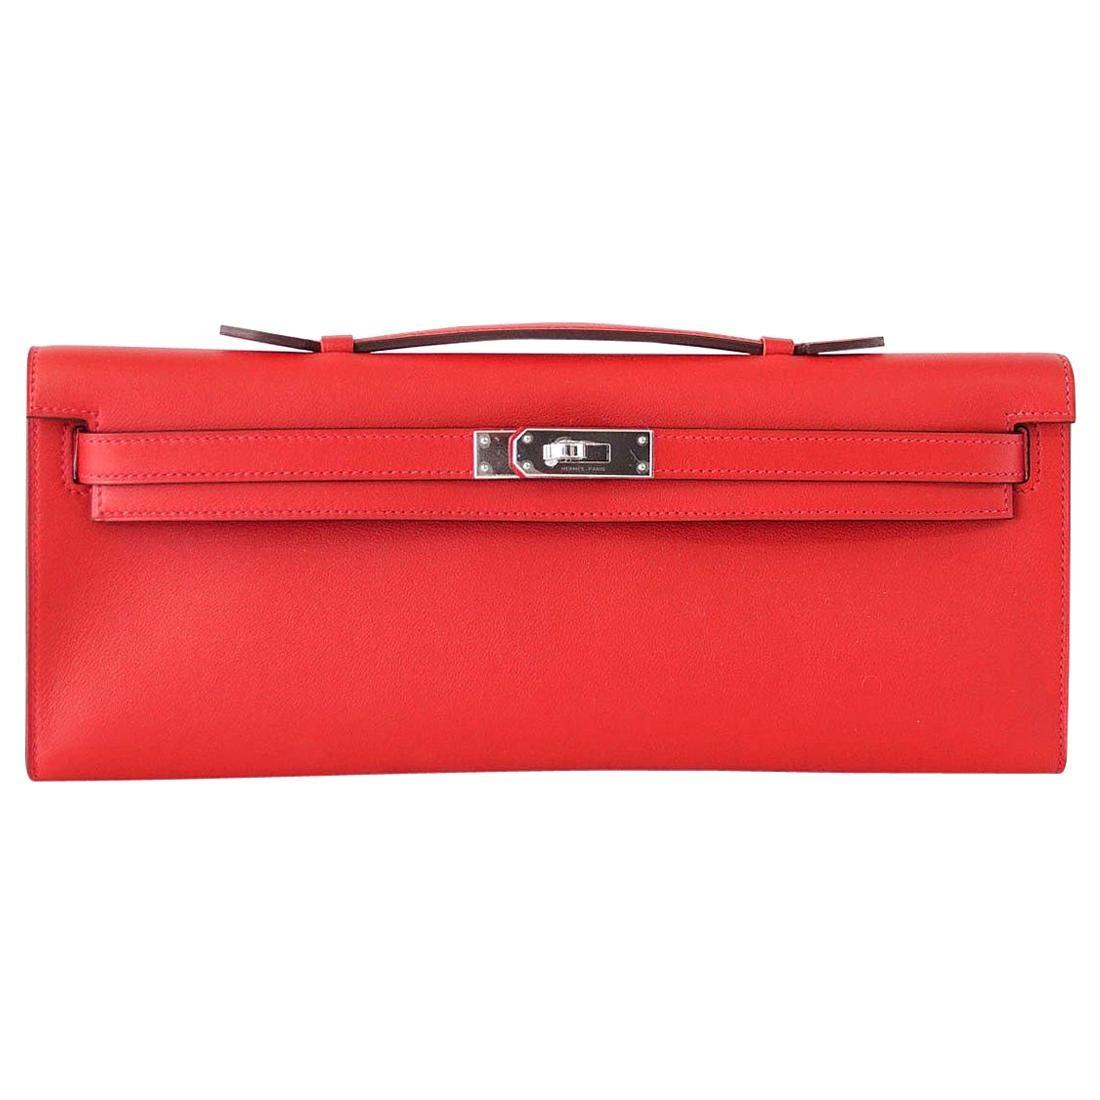 Hermes Kelly Cut Vermillion Red Clutch Bag Swift Palladium